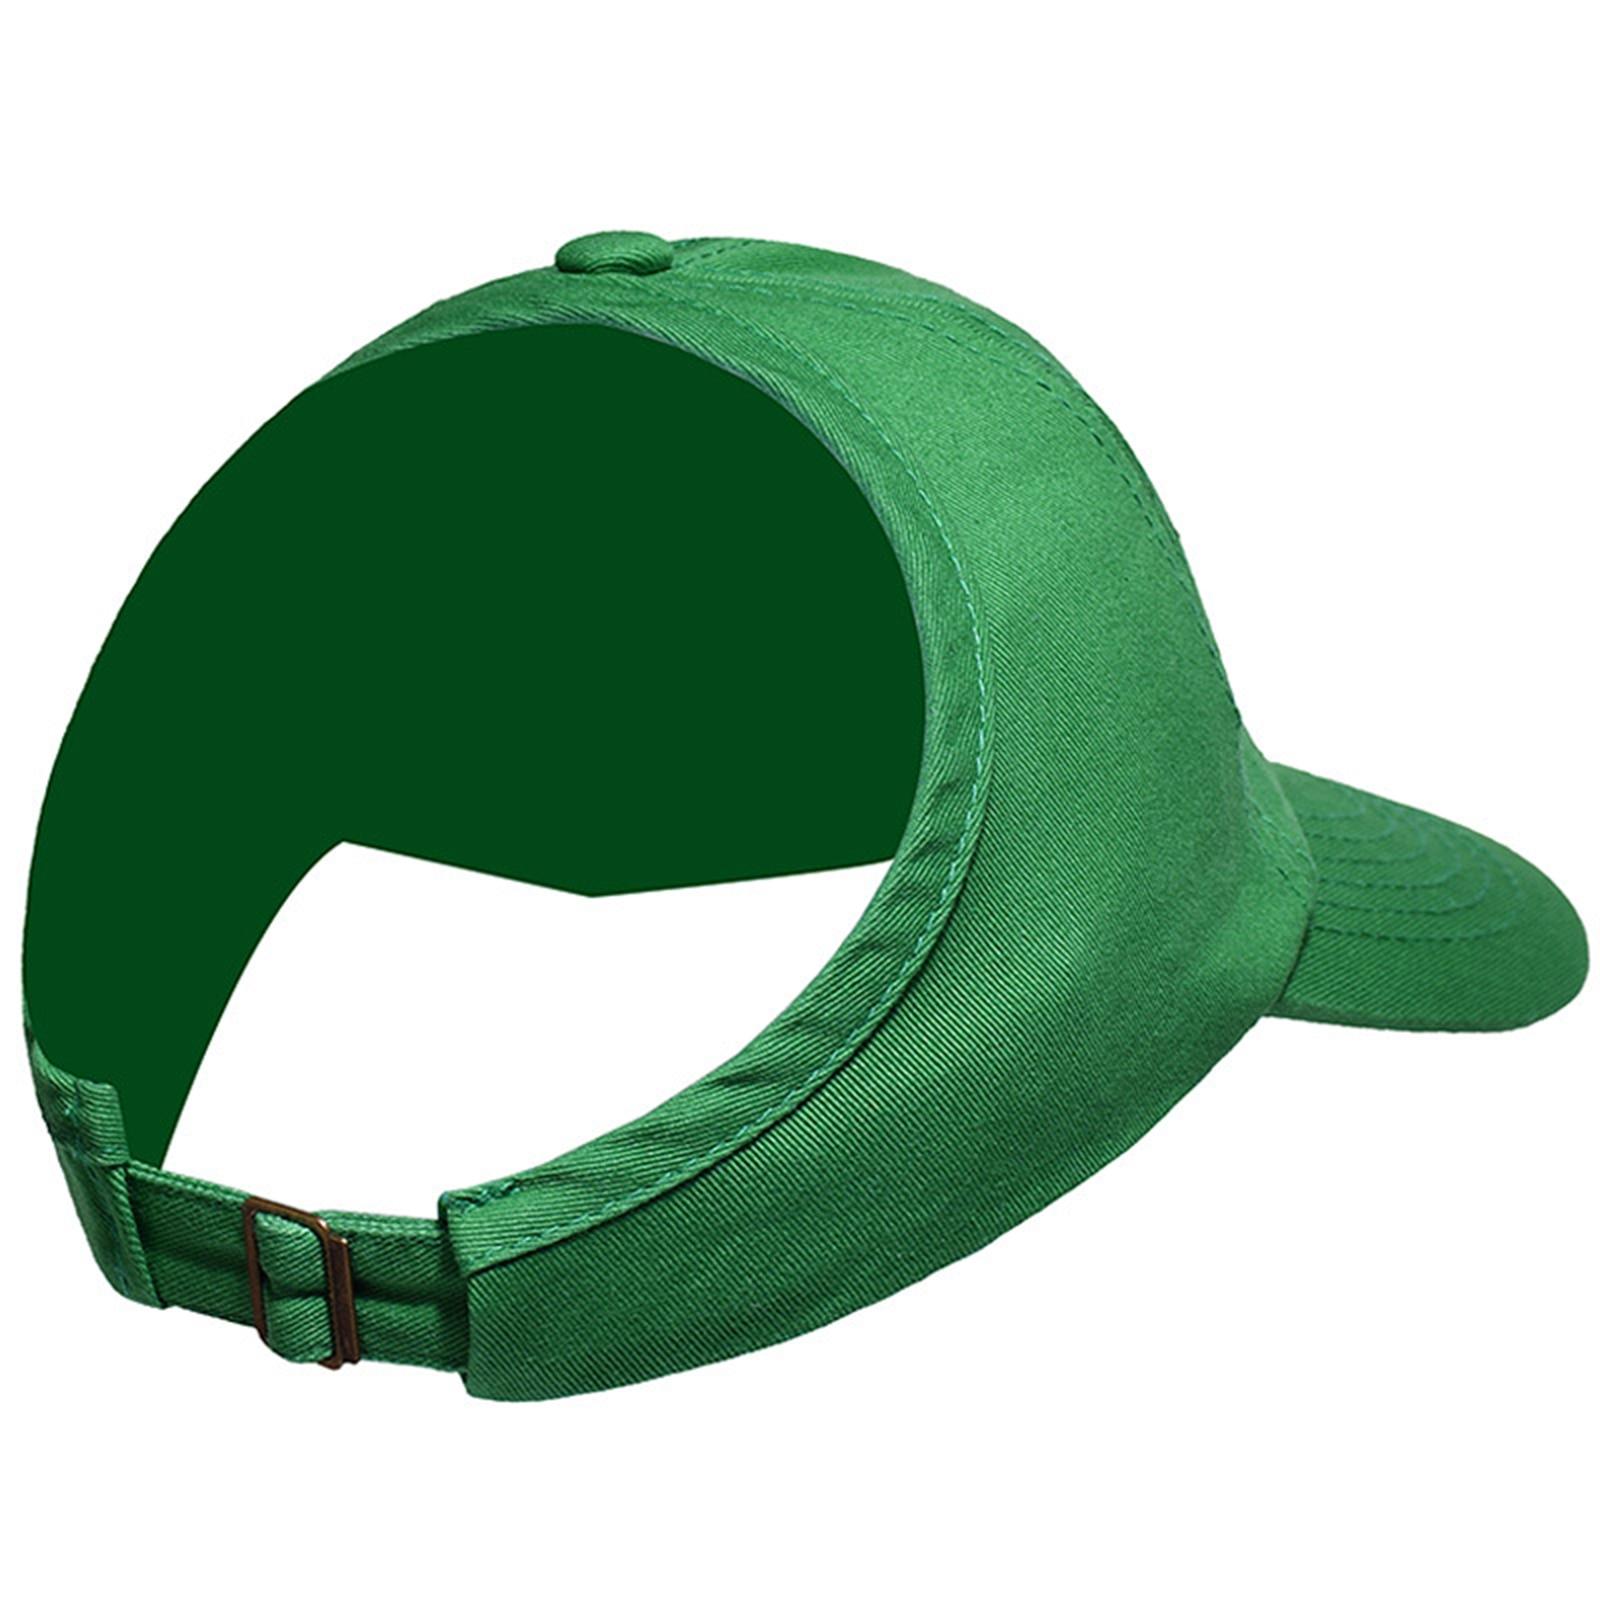 Backless Ponytail Hat Sun Visor for Women Puff Ponytail Baseball  Beach Camping Travel Curly Hair s